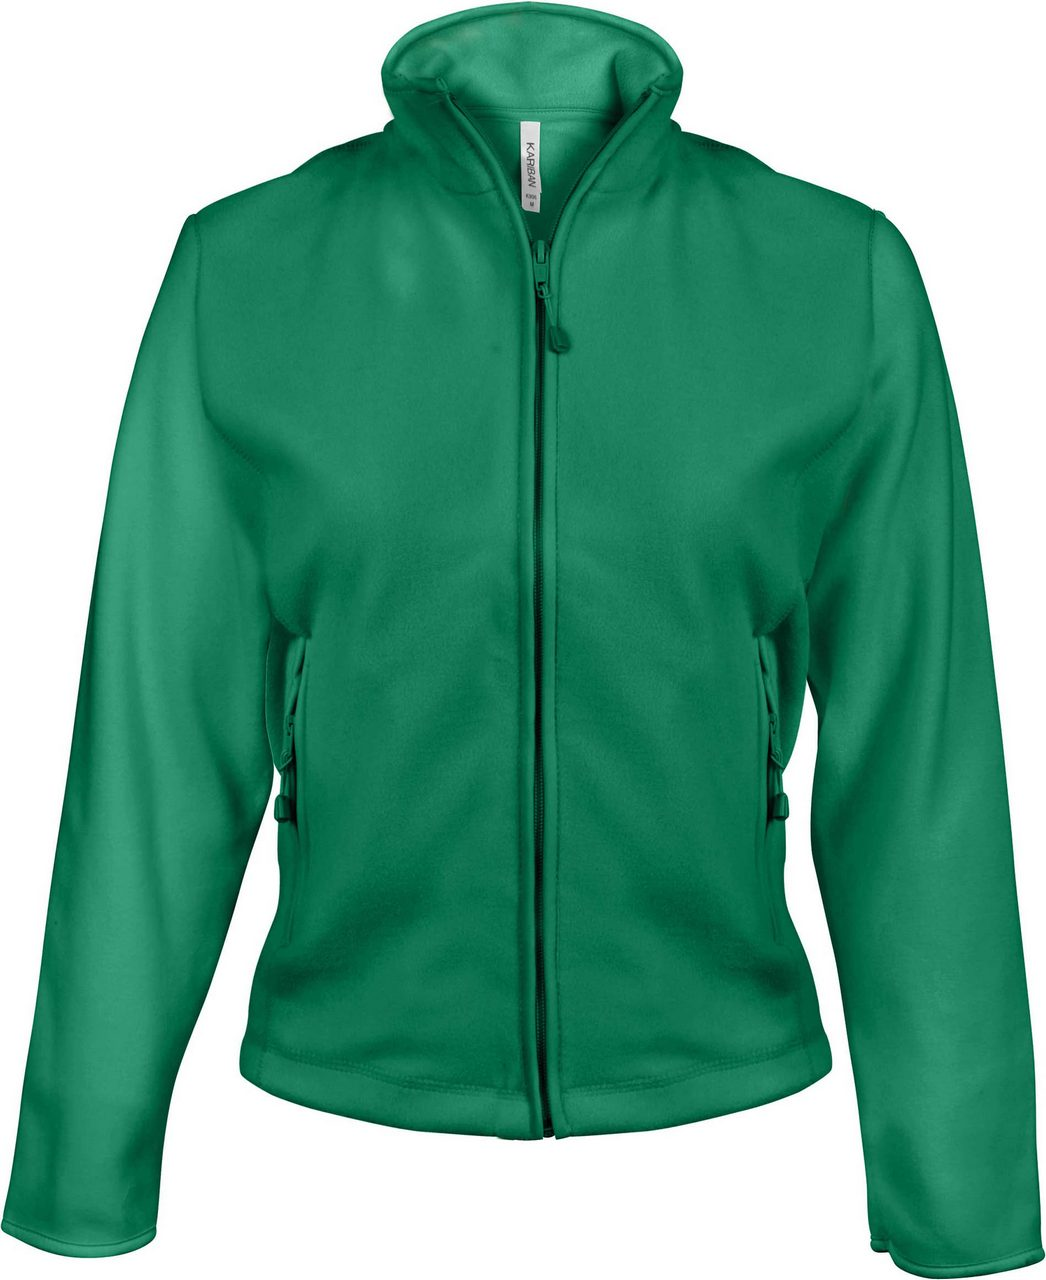 Fleece KA907 verde kelly Veste jachete dama barbatesti polar fleece softshell fas gluga ploaie vant broderie serigrafie termotransfer   Toroadv.ro